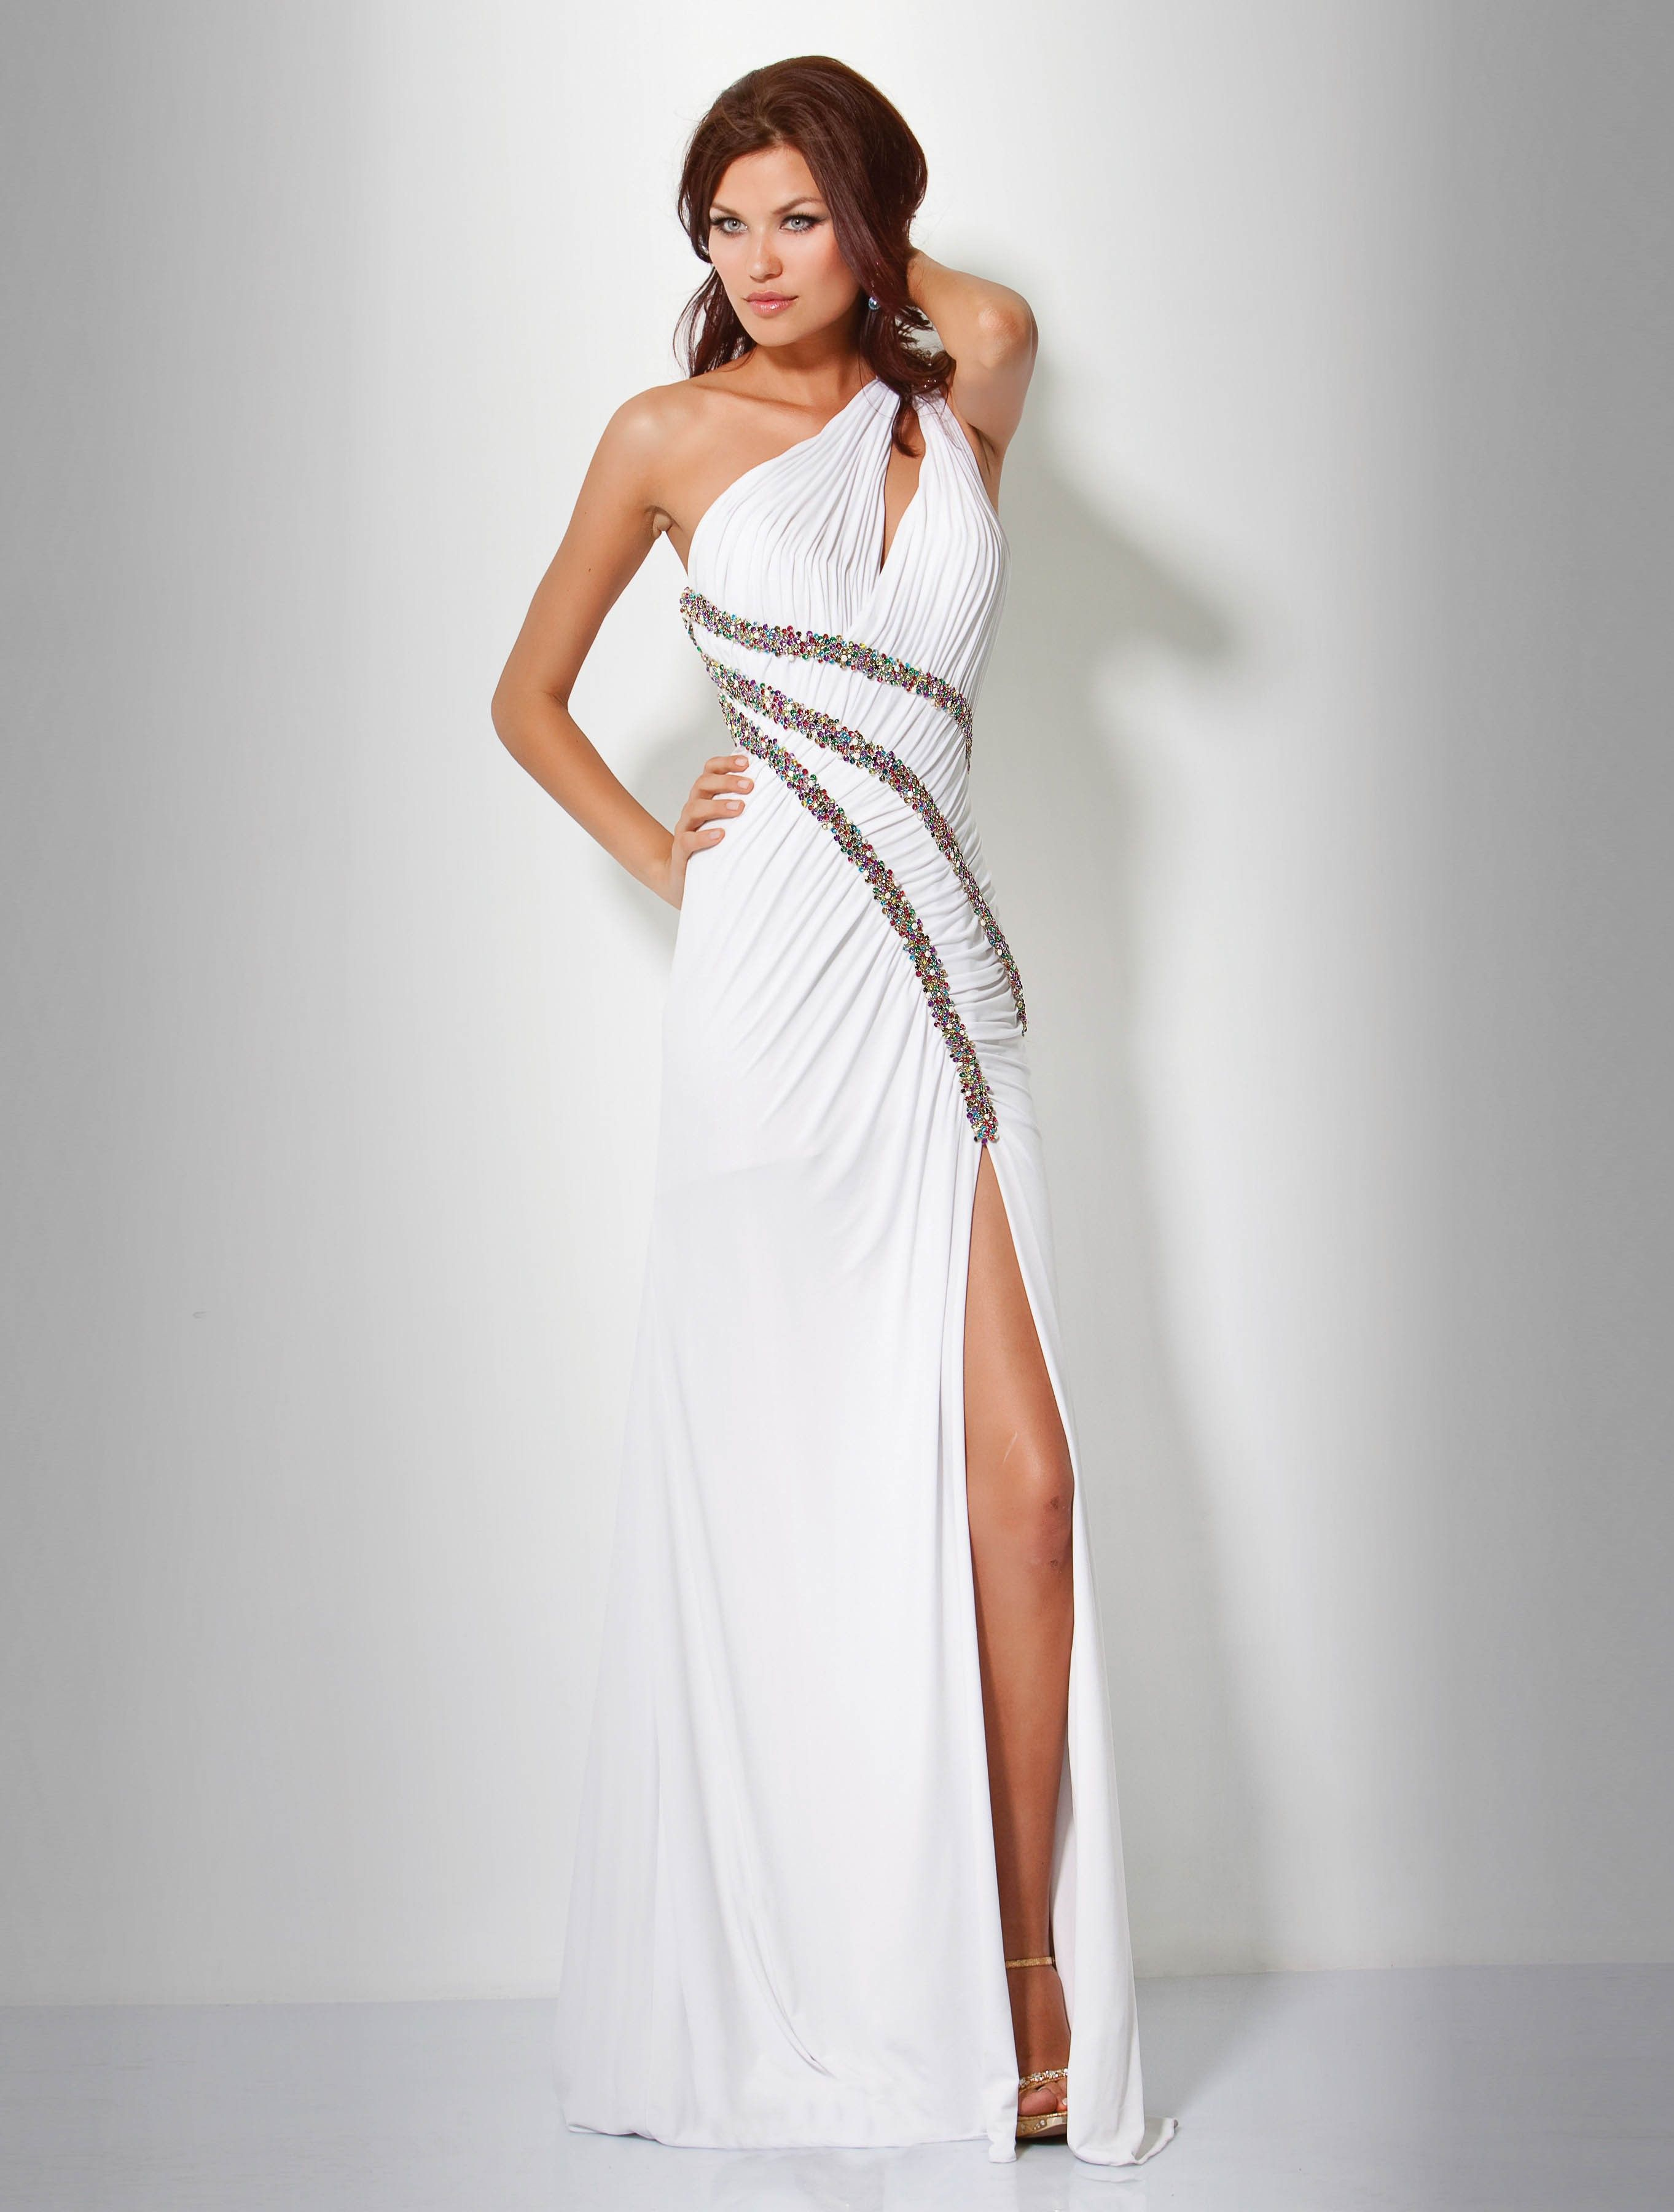 Sheath/Column One Shoulder Floor-Length Chiffon Prom/Evening Dress